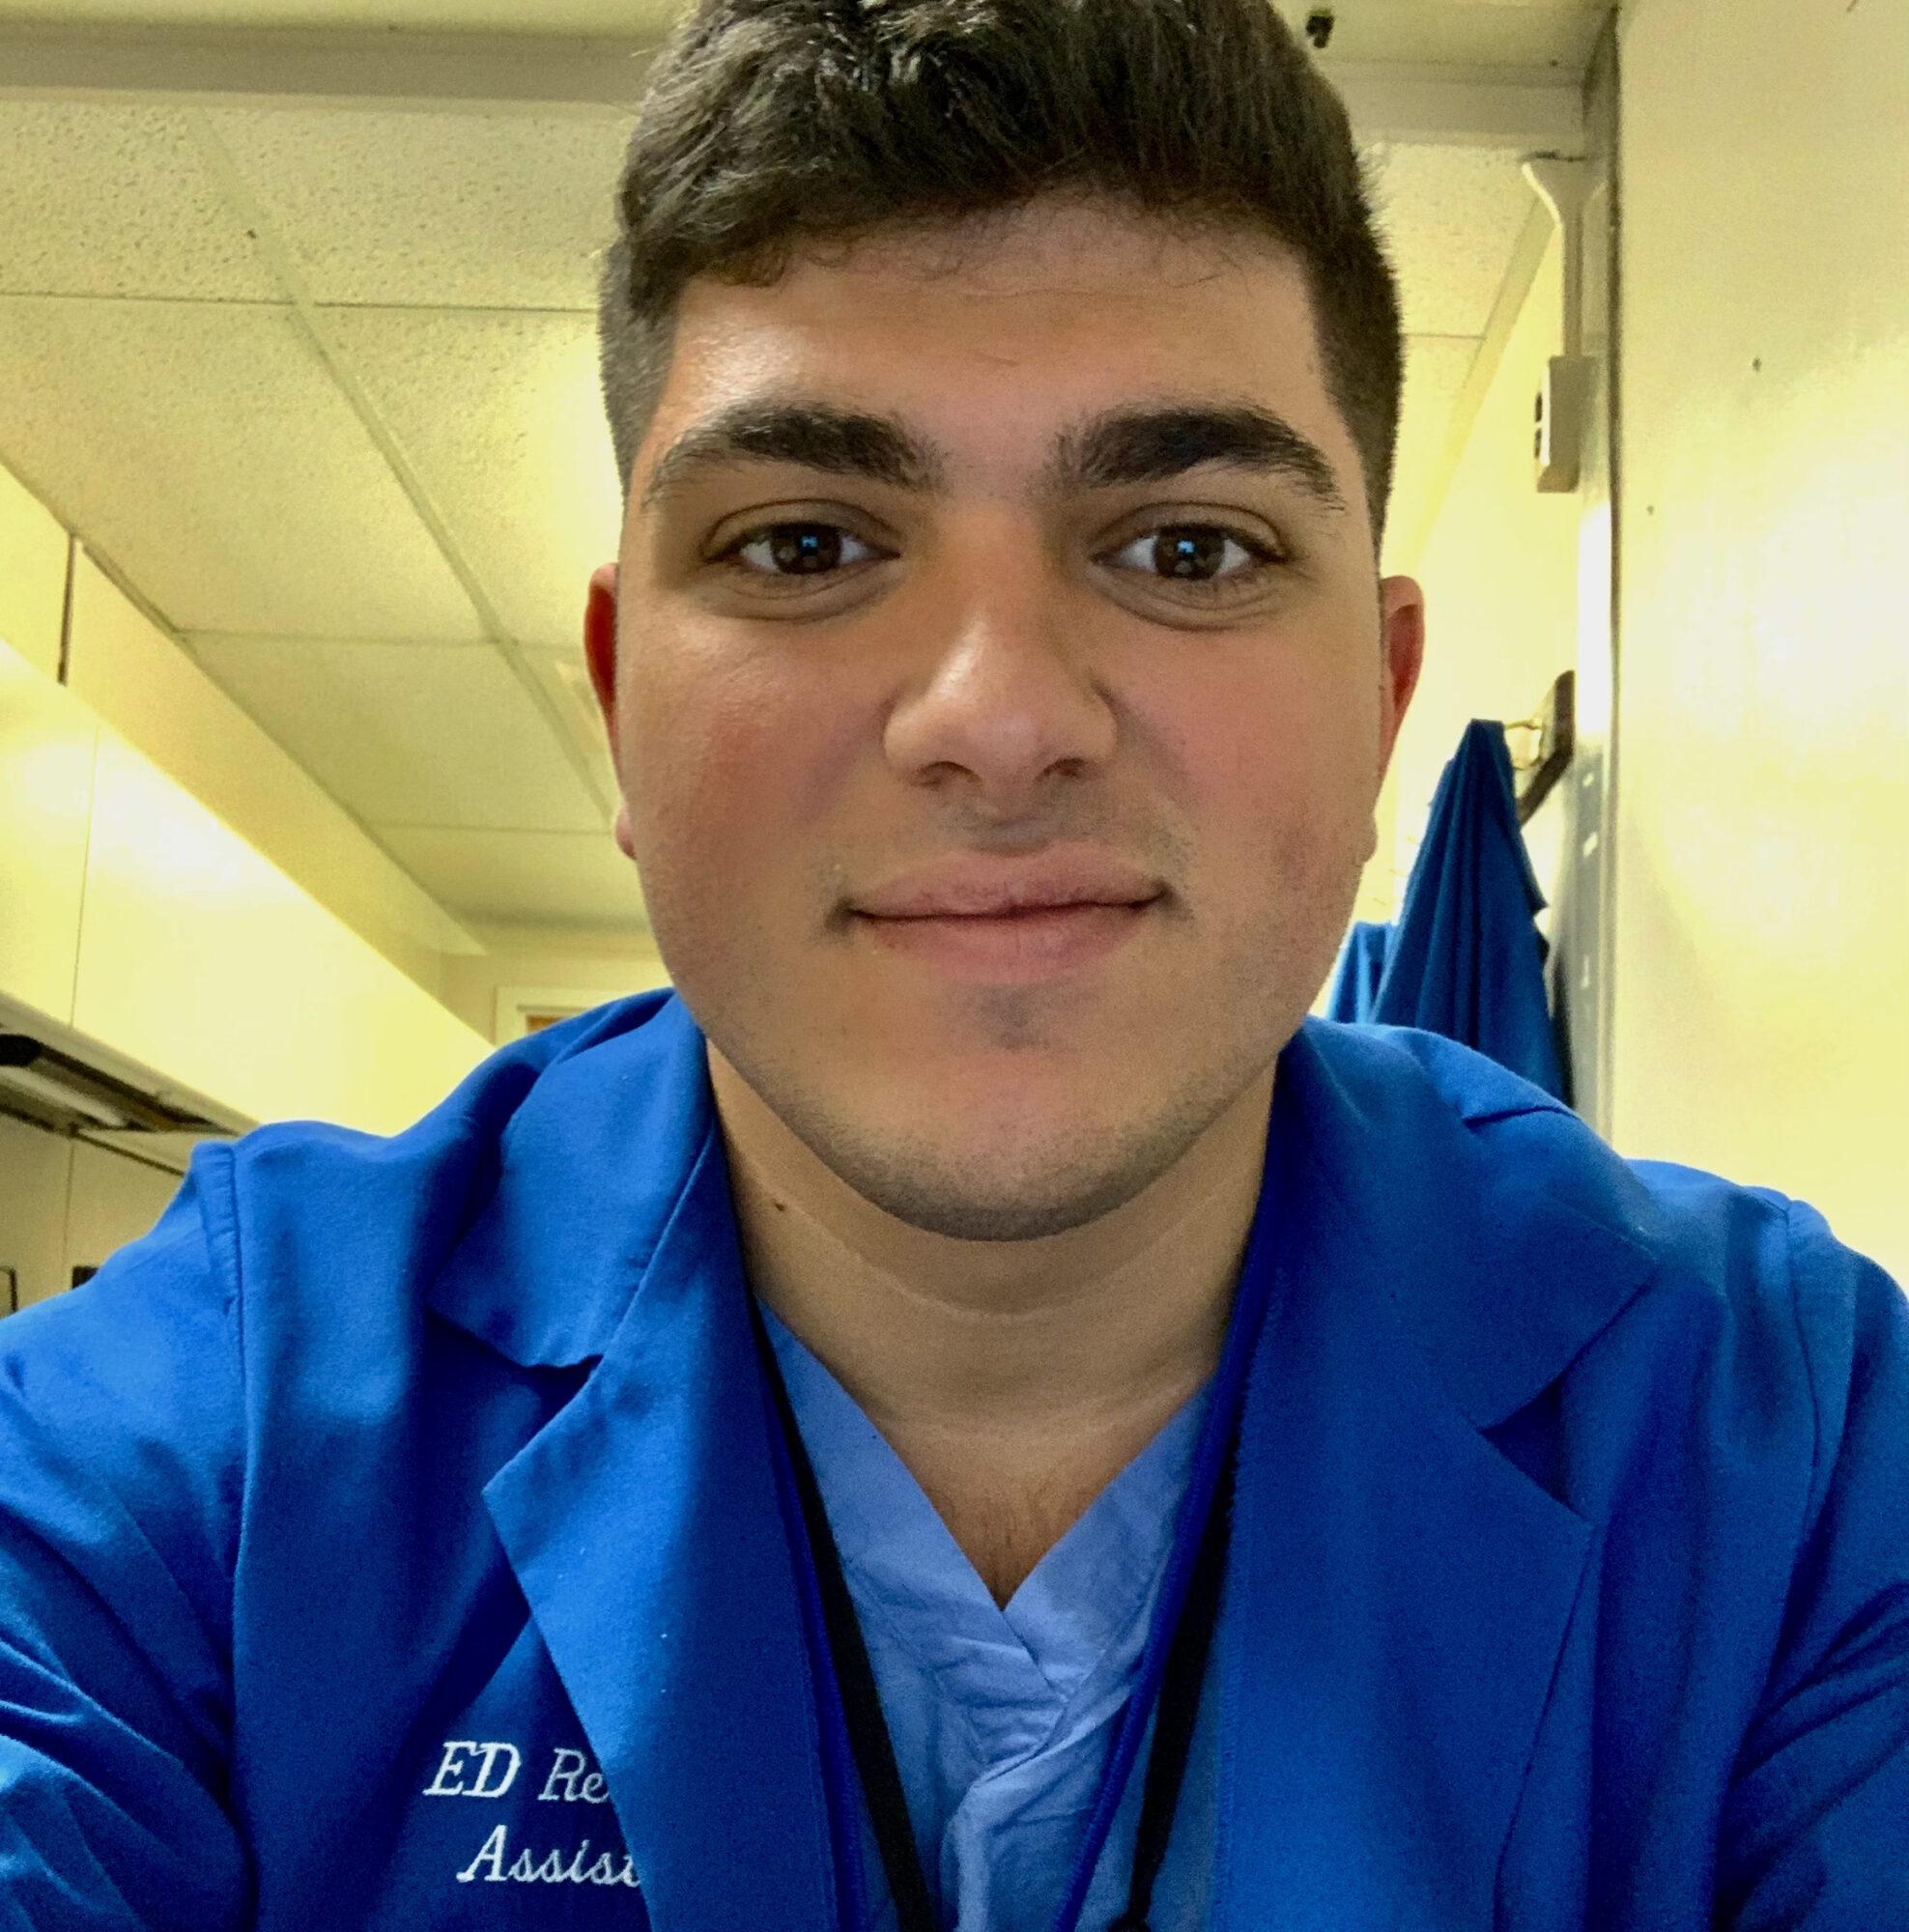 headshot of a man in a dental jacket